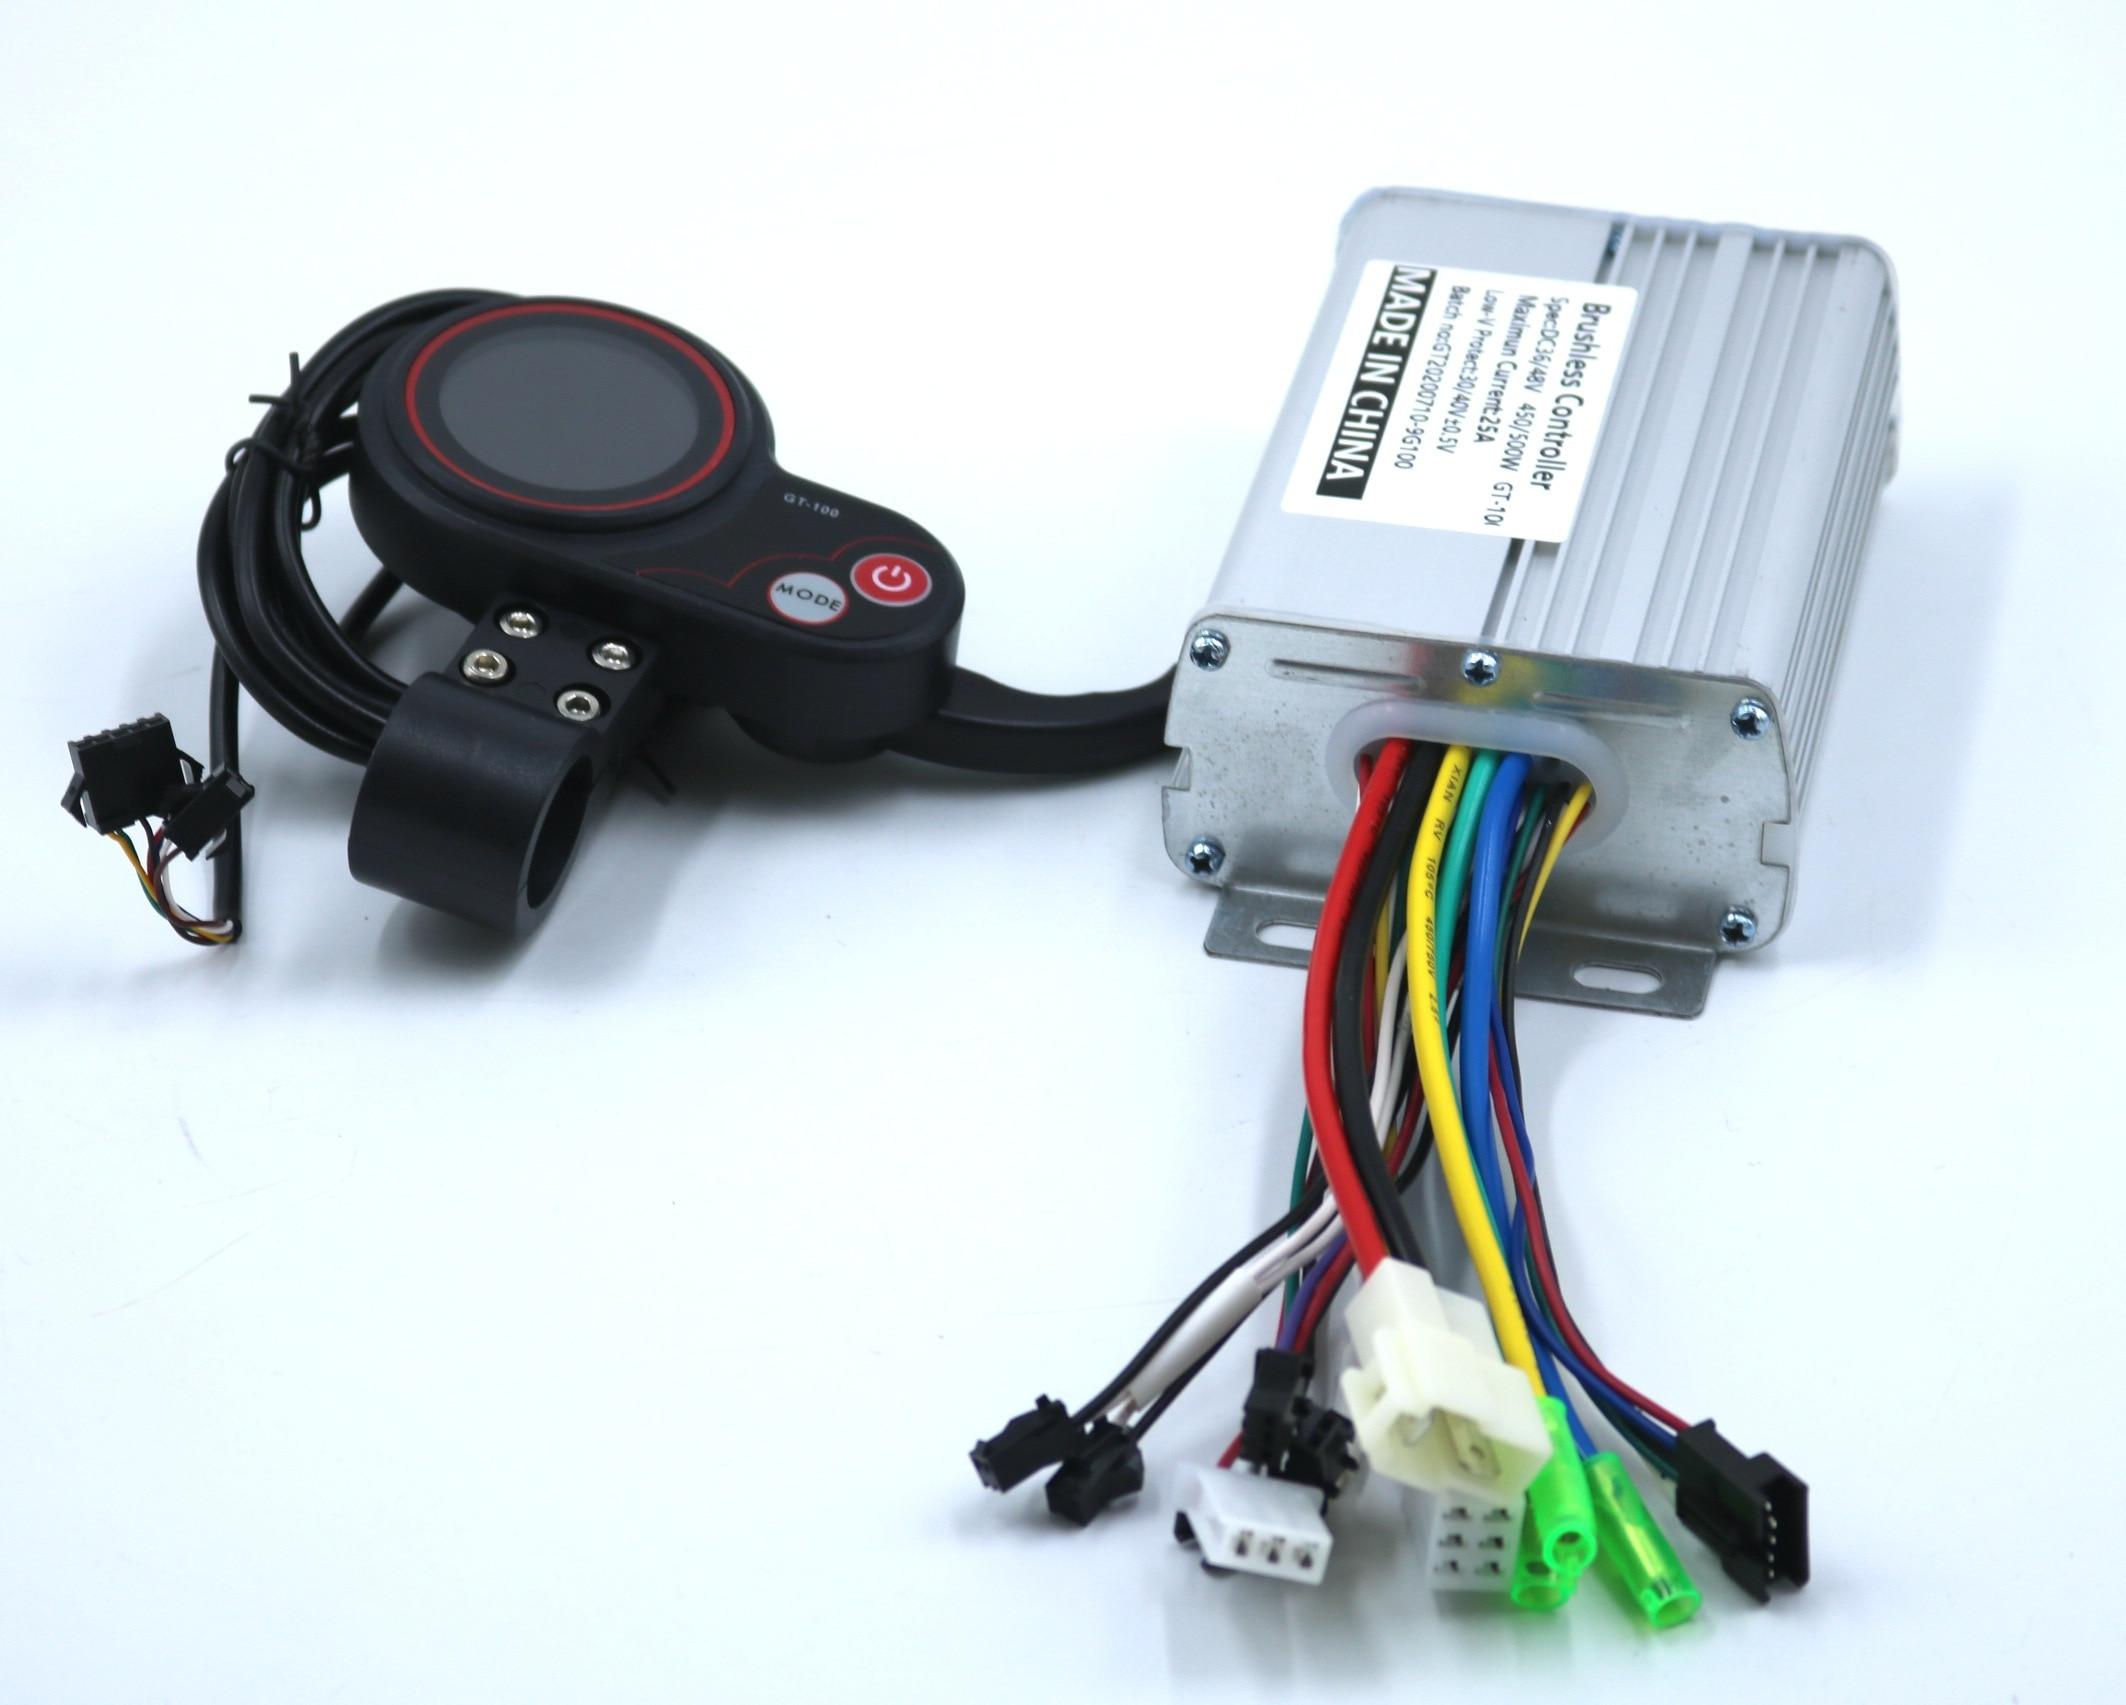 GREENTIME GREENTIME 36V/48V/52V/60V 500W 25A BLDC חשמלי קטנוע בקר E-אופני brushless נהג וחכם LCD תצוגת אחת סט